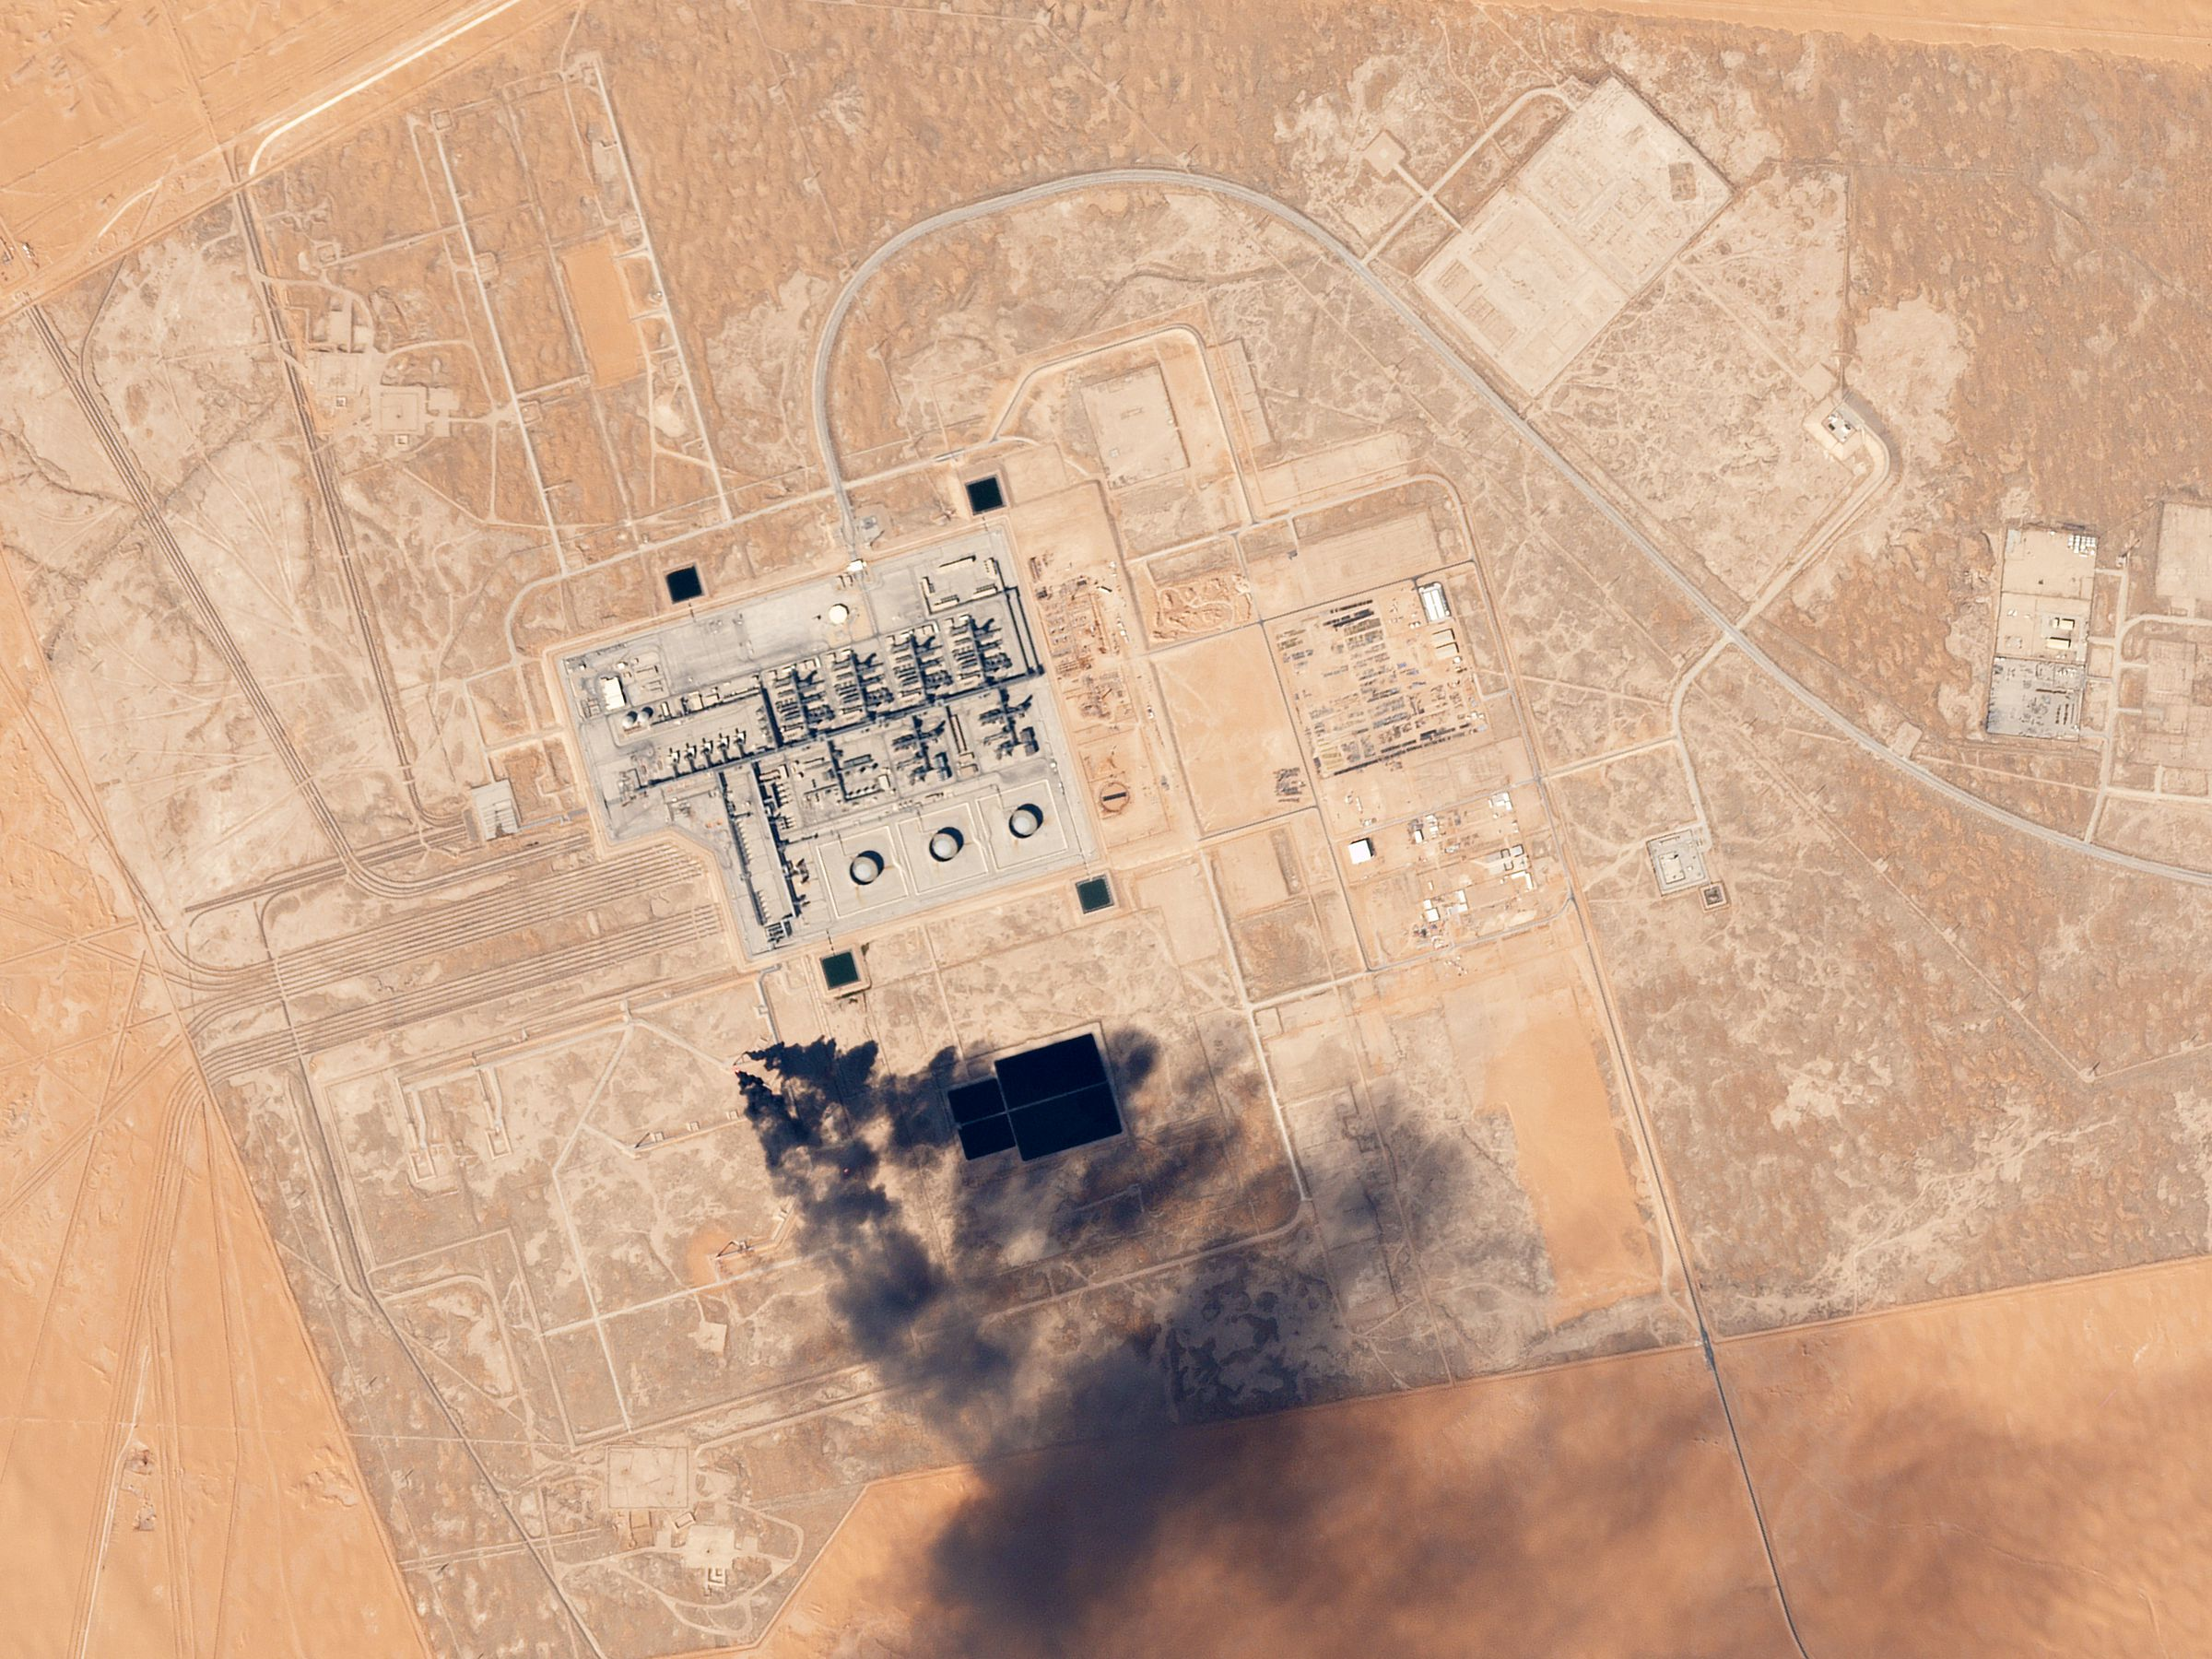 Saudi Arabia Faces Short-term Oil Crisis